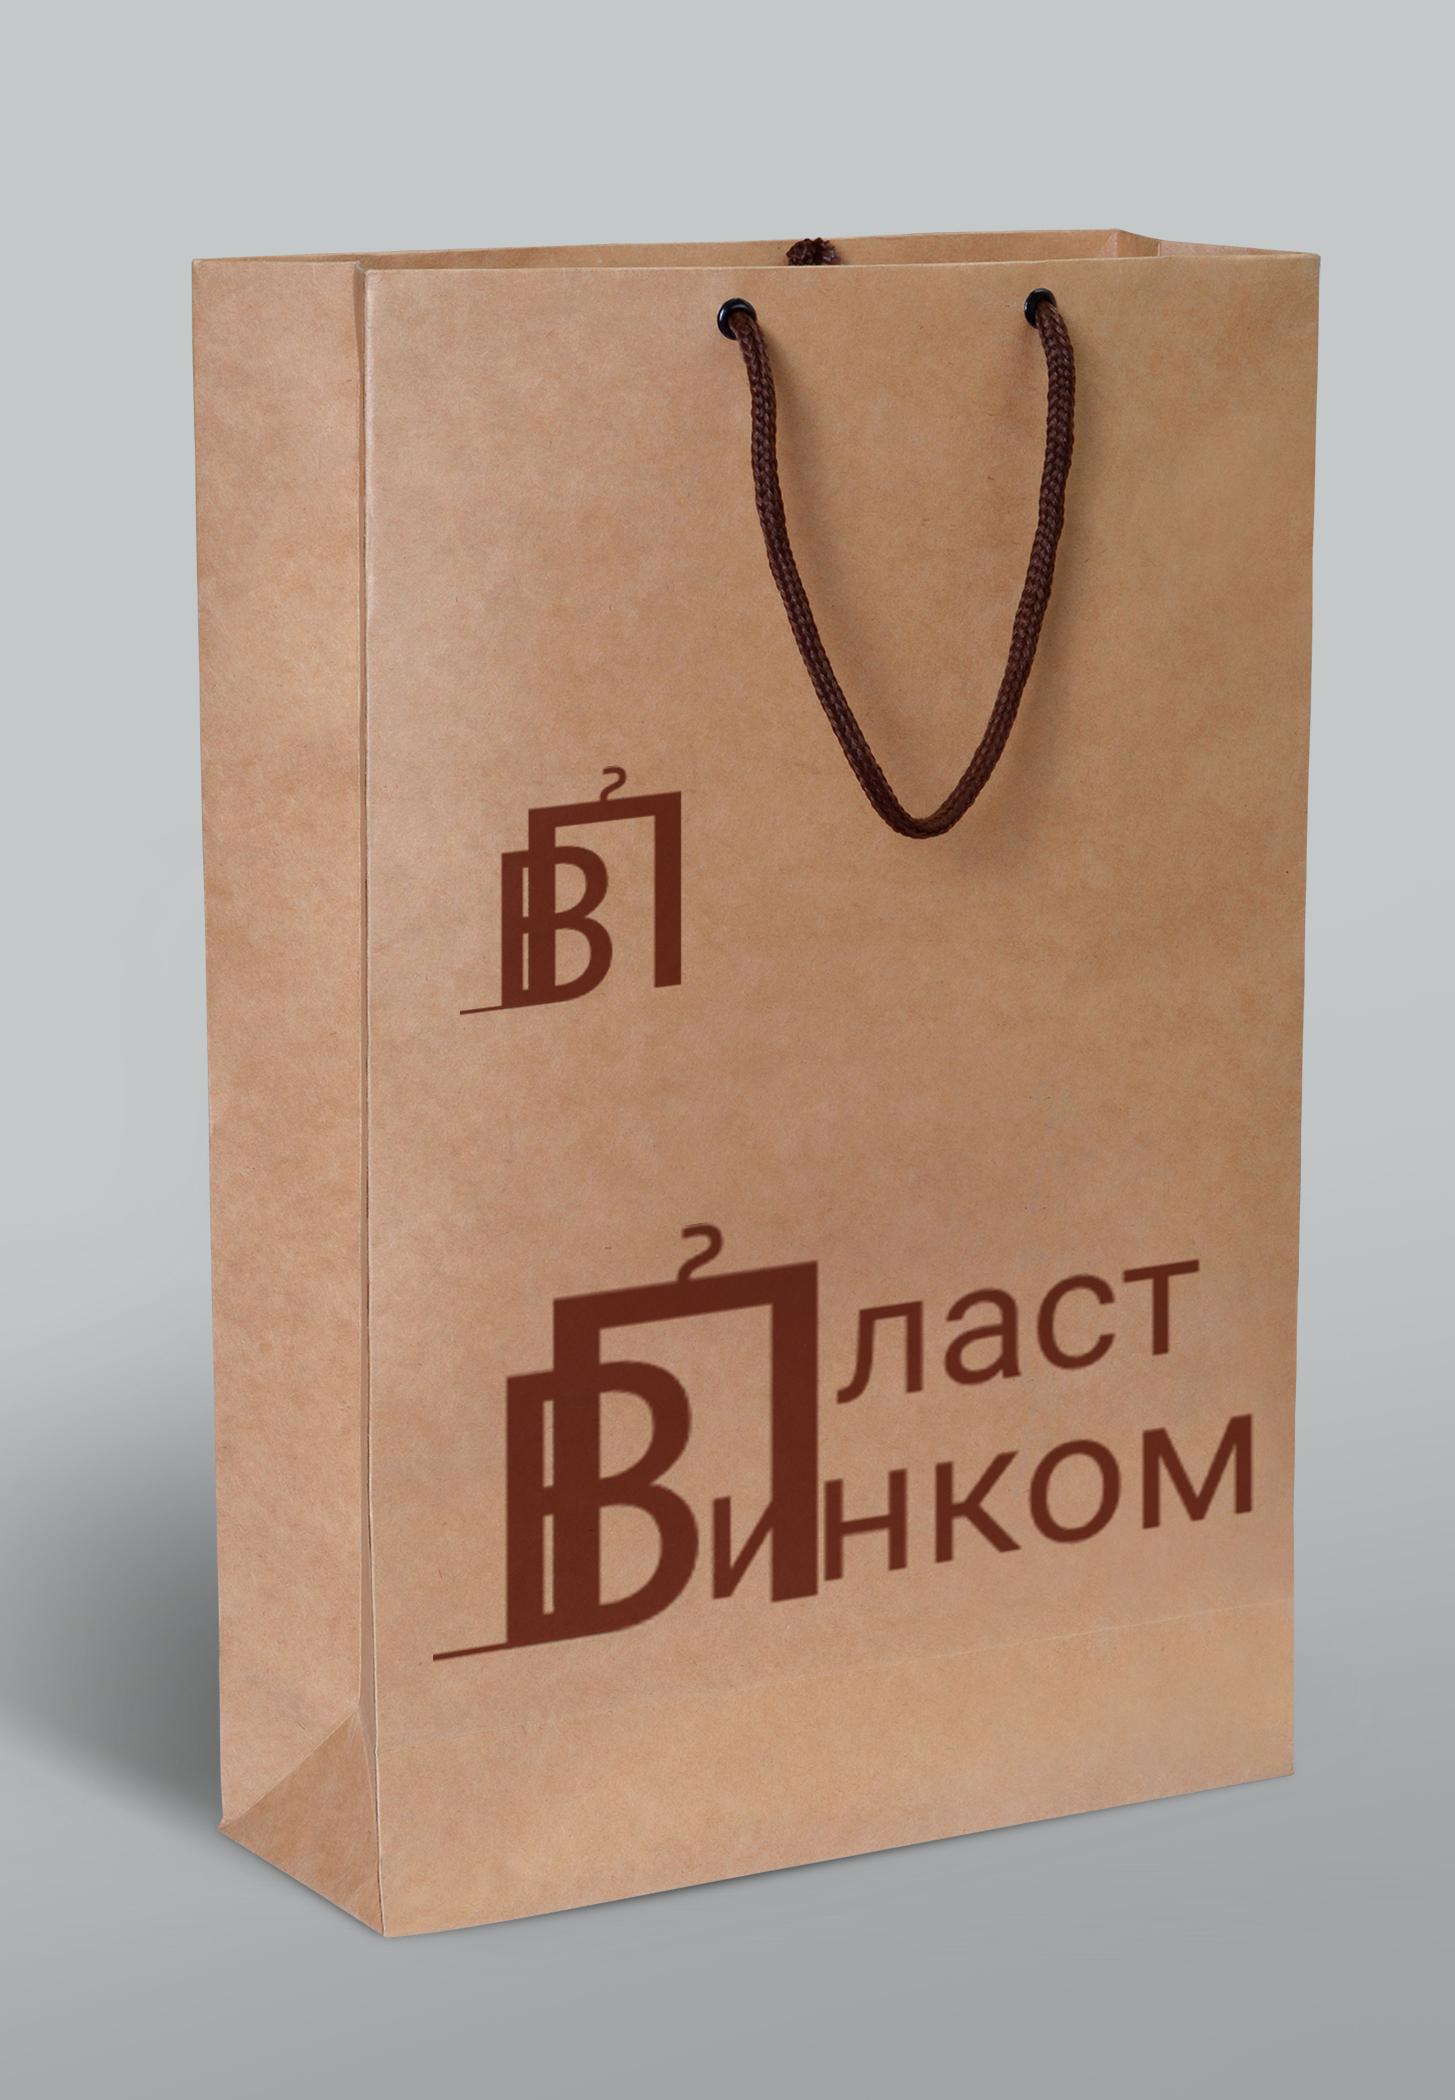 Логотип, фавикон и визитка для компании Винком Пласт  фото f_4495c36f055eb73a.jpg